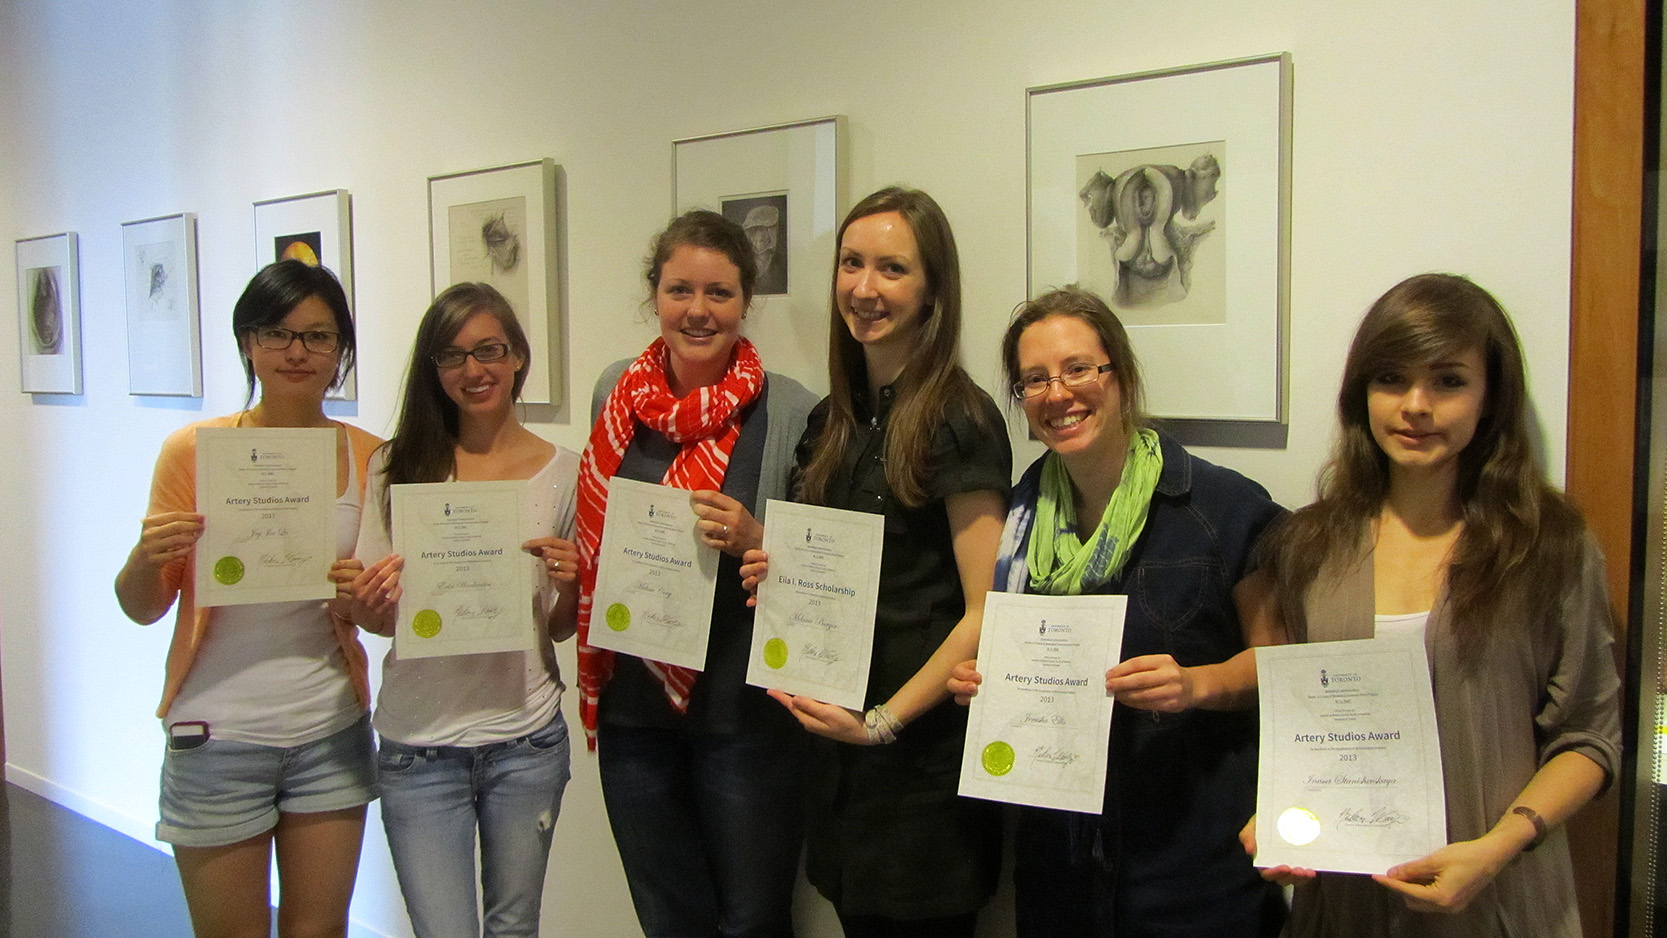 Joy Qu, Erin Warketin, Melissa Cory, Melanie Burger, Jerusha Ellis, Inessa Stanishevskaya. Photo credit: Laura Smith